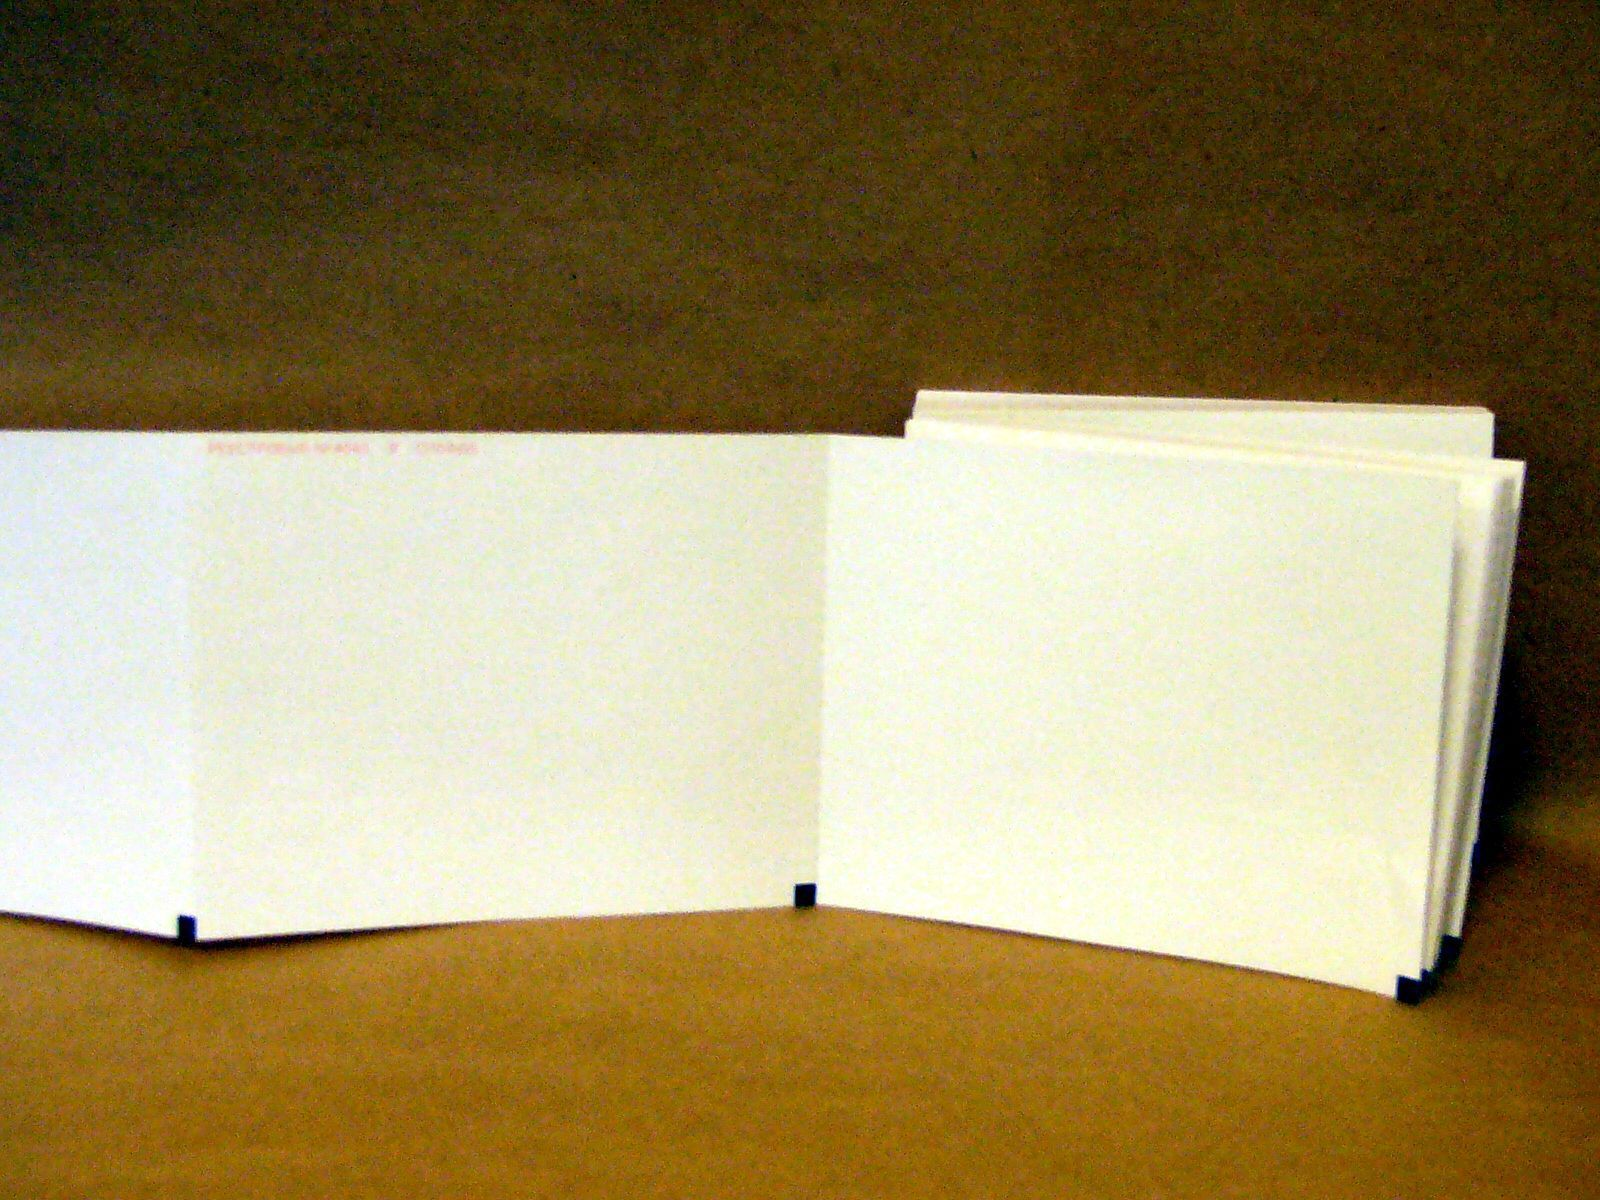 110х140х145, бумага ЭКГ для Nihon Kohden Cardiofax 9010, ЮНИ-2, реестр 4040/1